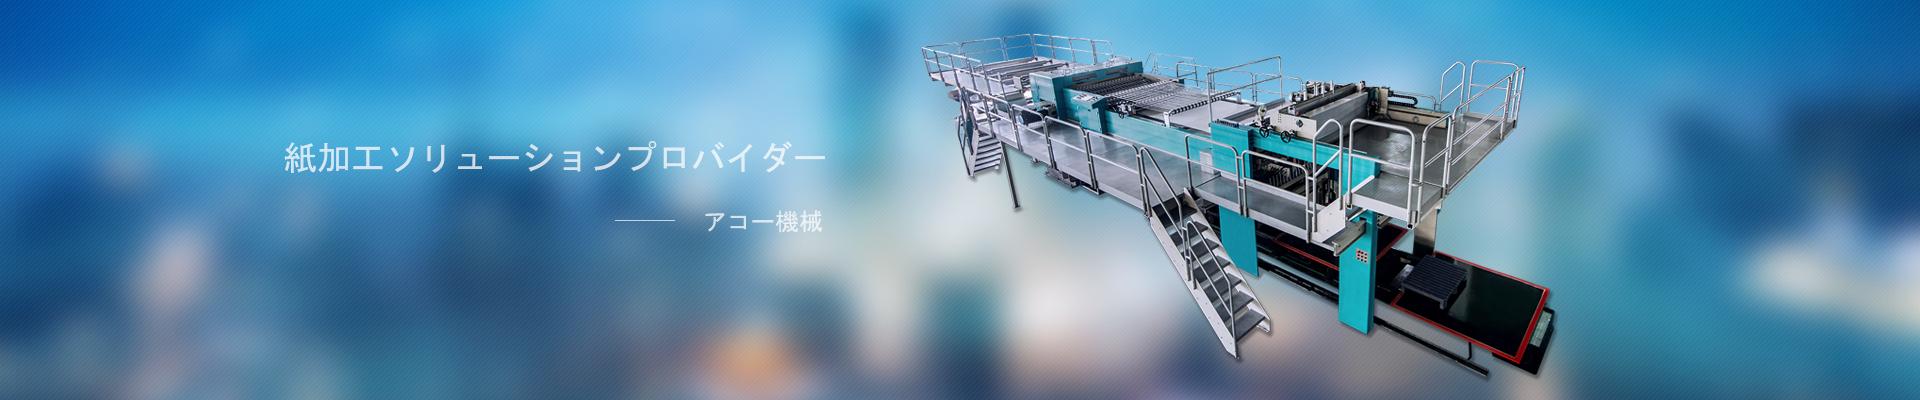 https://www.greatwallmachinery.com.cn/jp/data/upload/202004/20200410080751_444.jpg